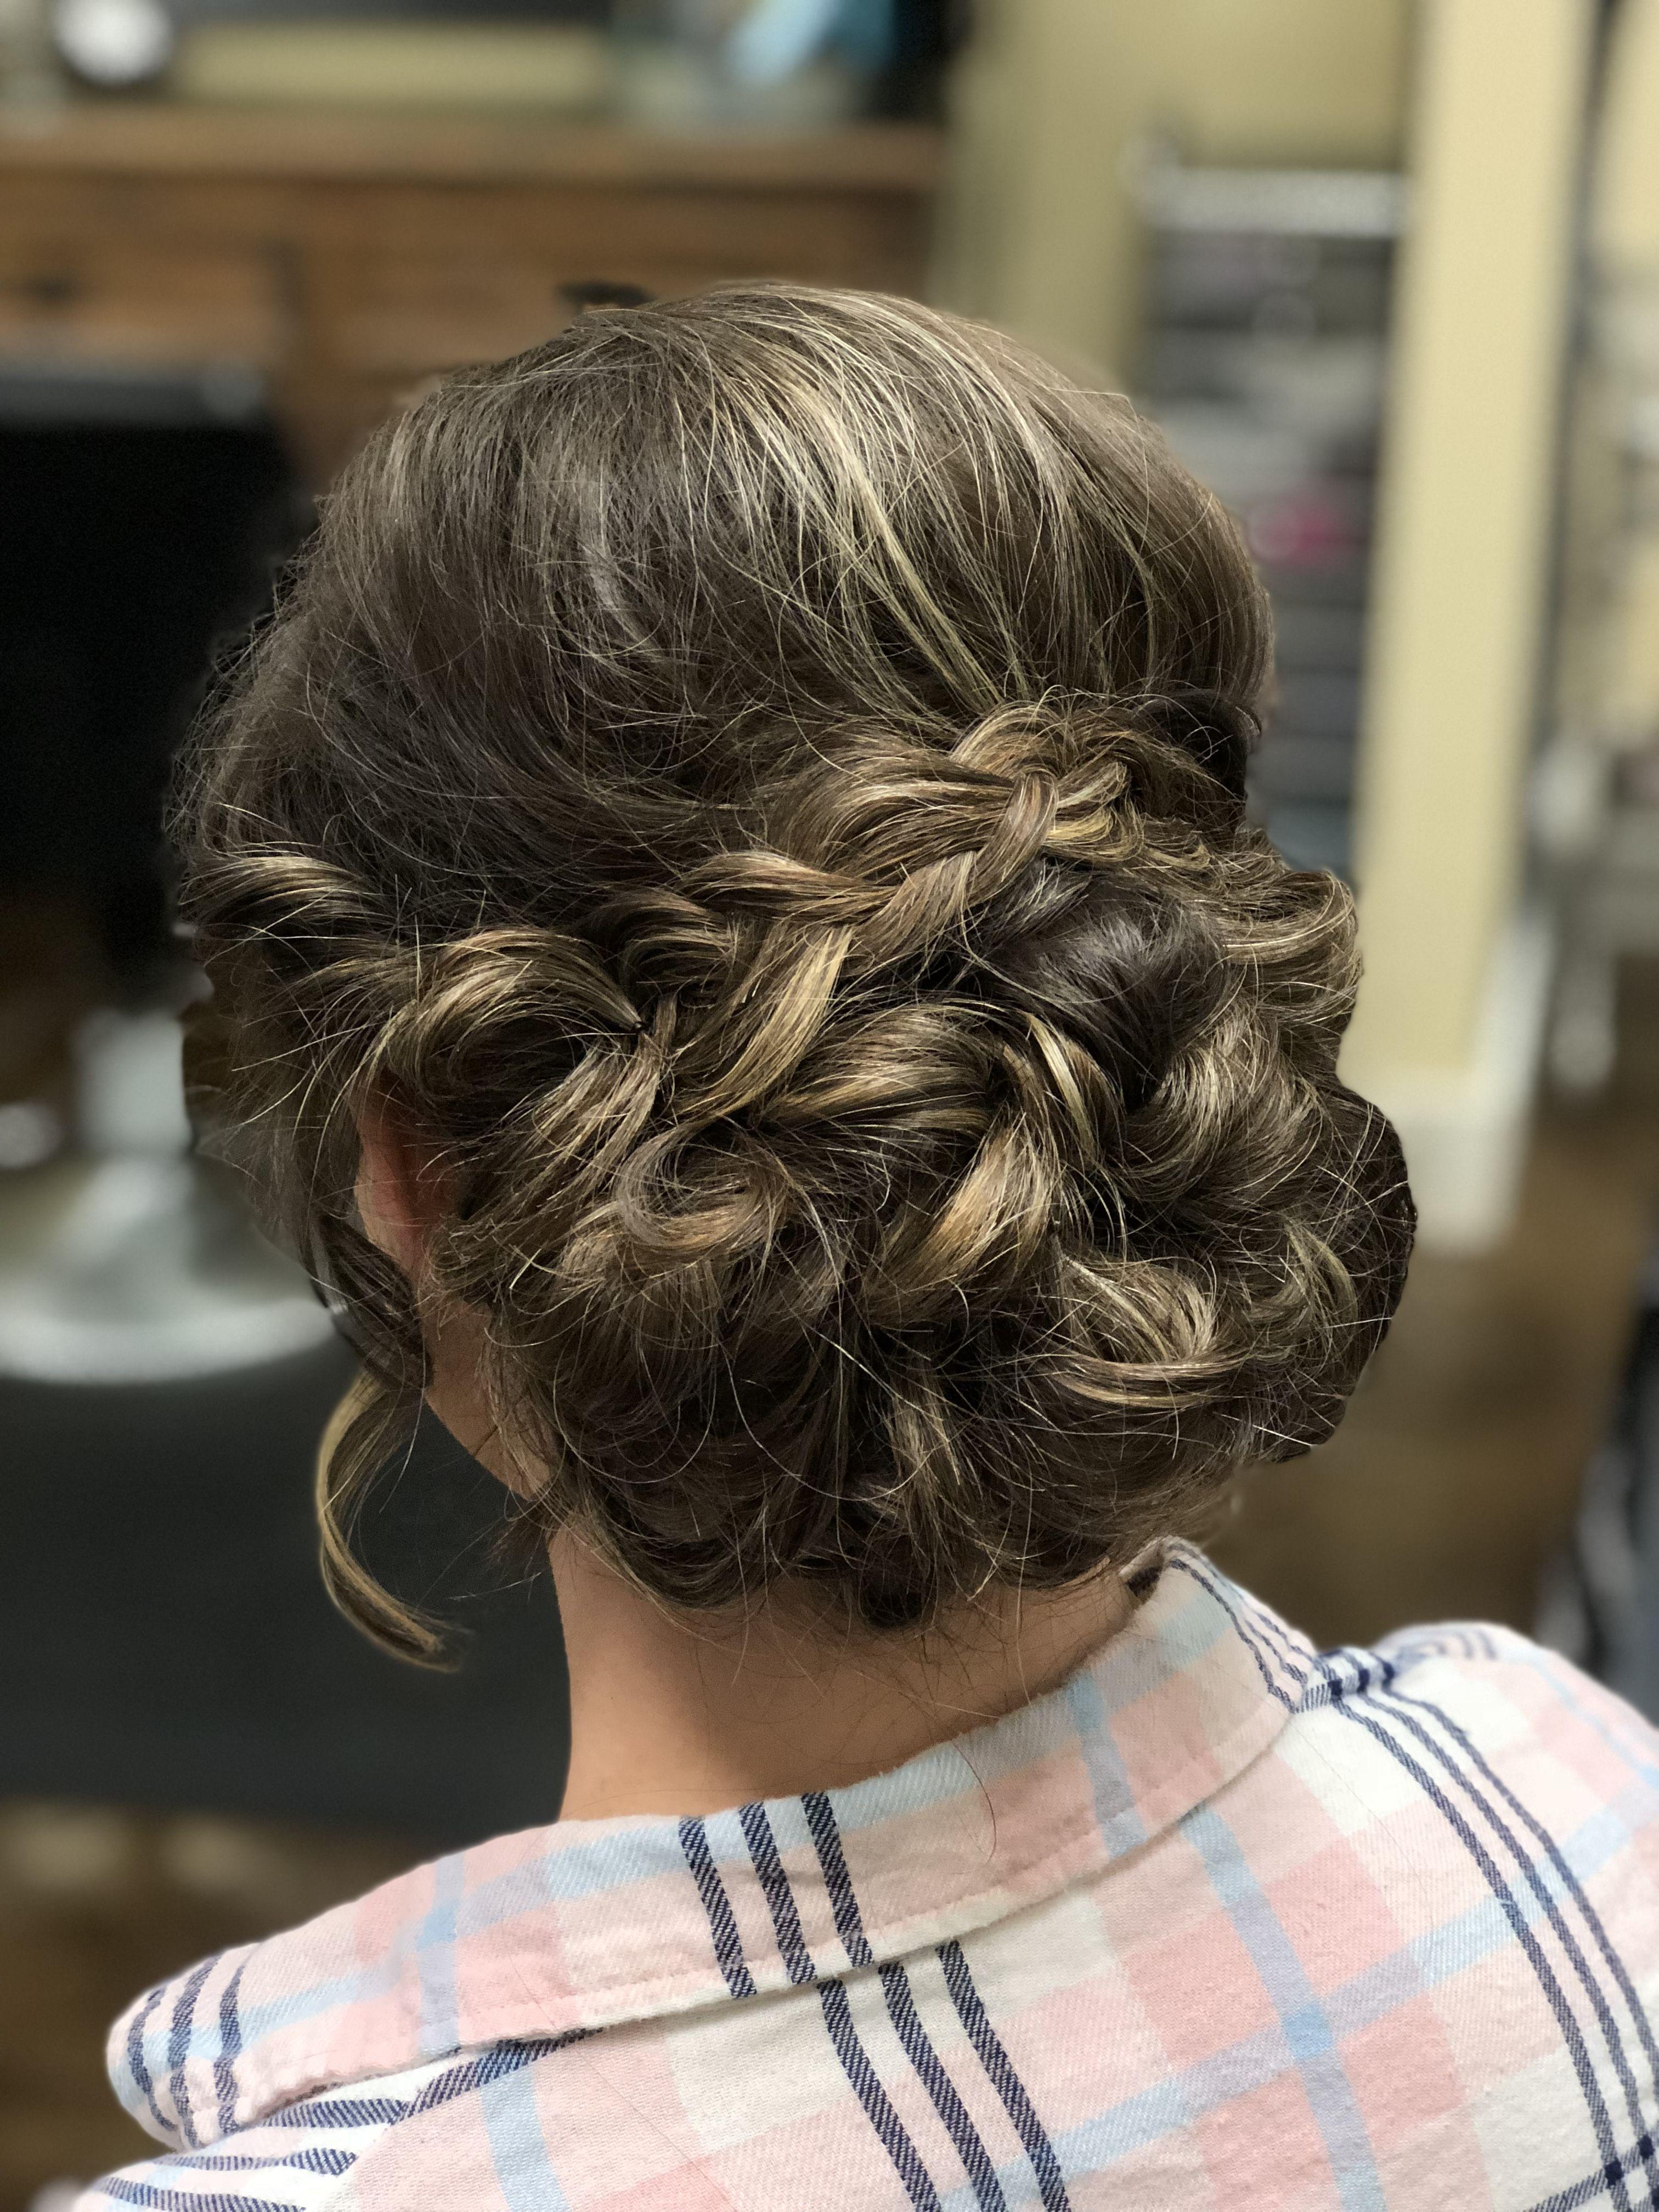 Prom hair inspiration braided updo caroline tedder hair